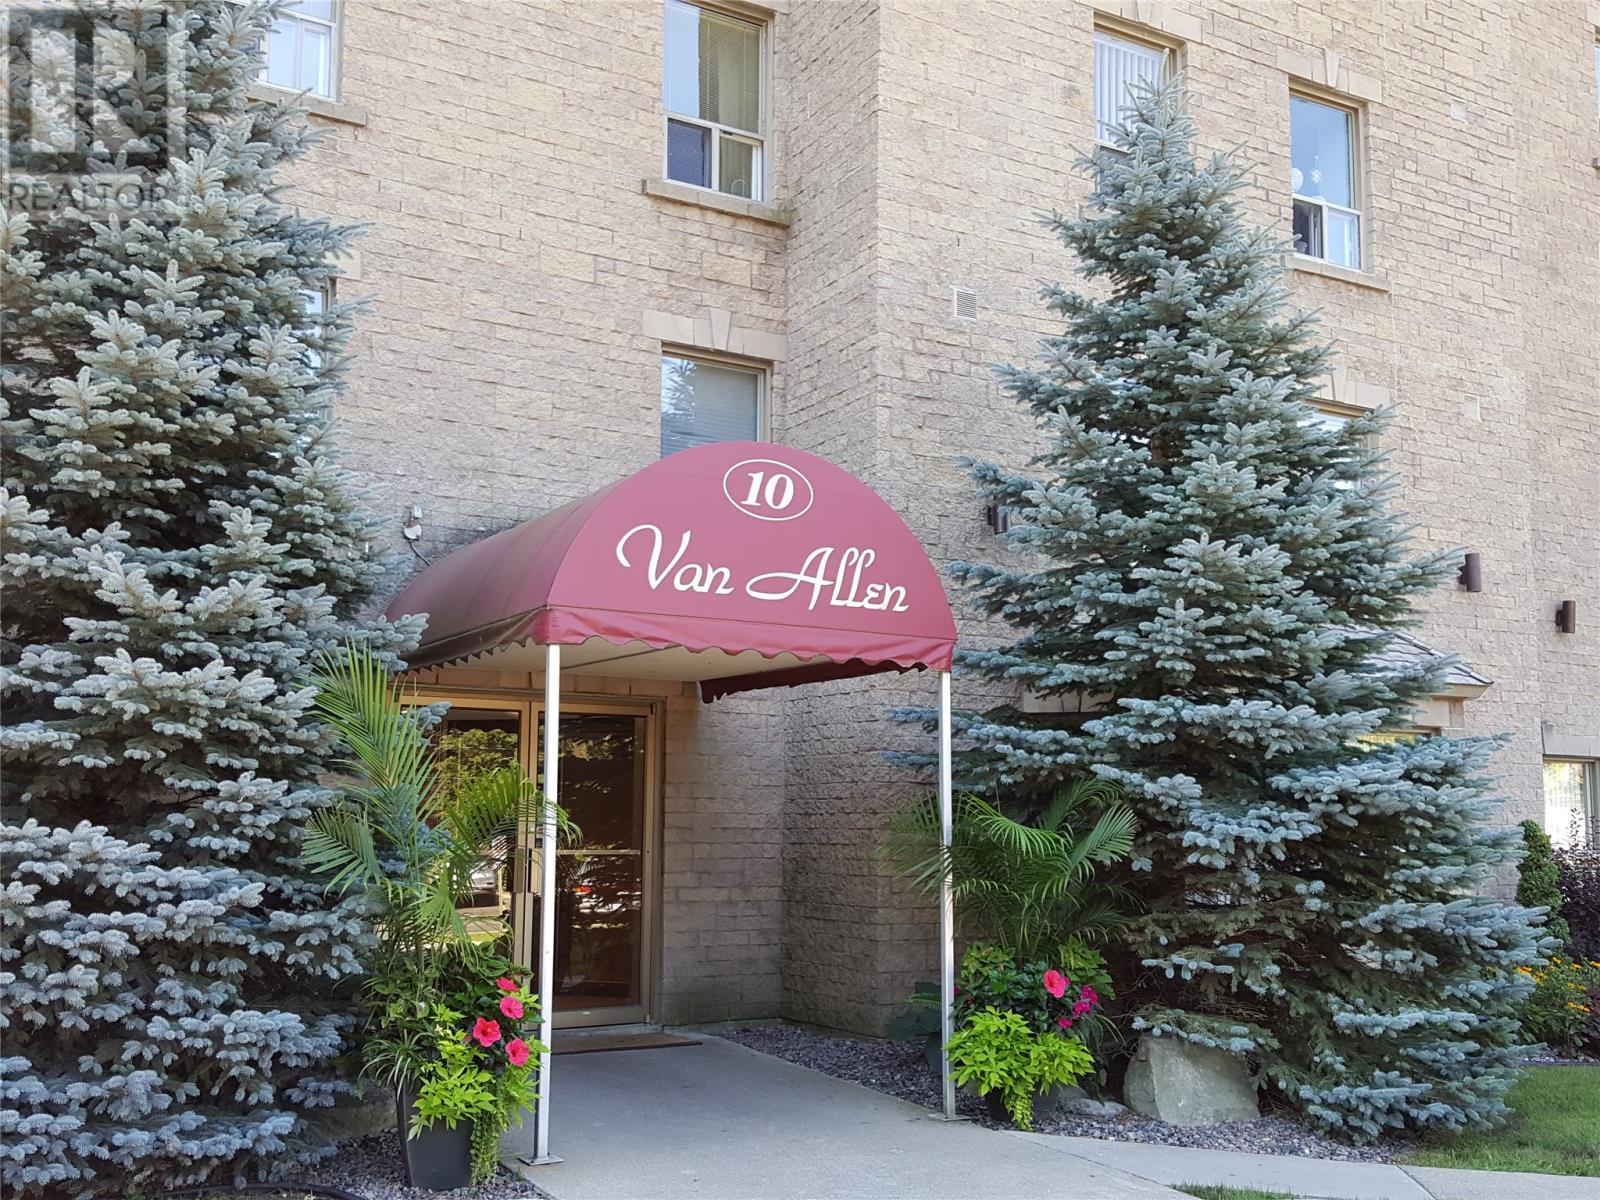 Buliding: 10 Van Allen Avenue, Chatham, ON